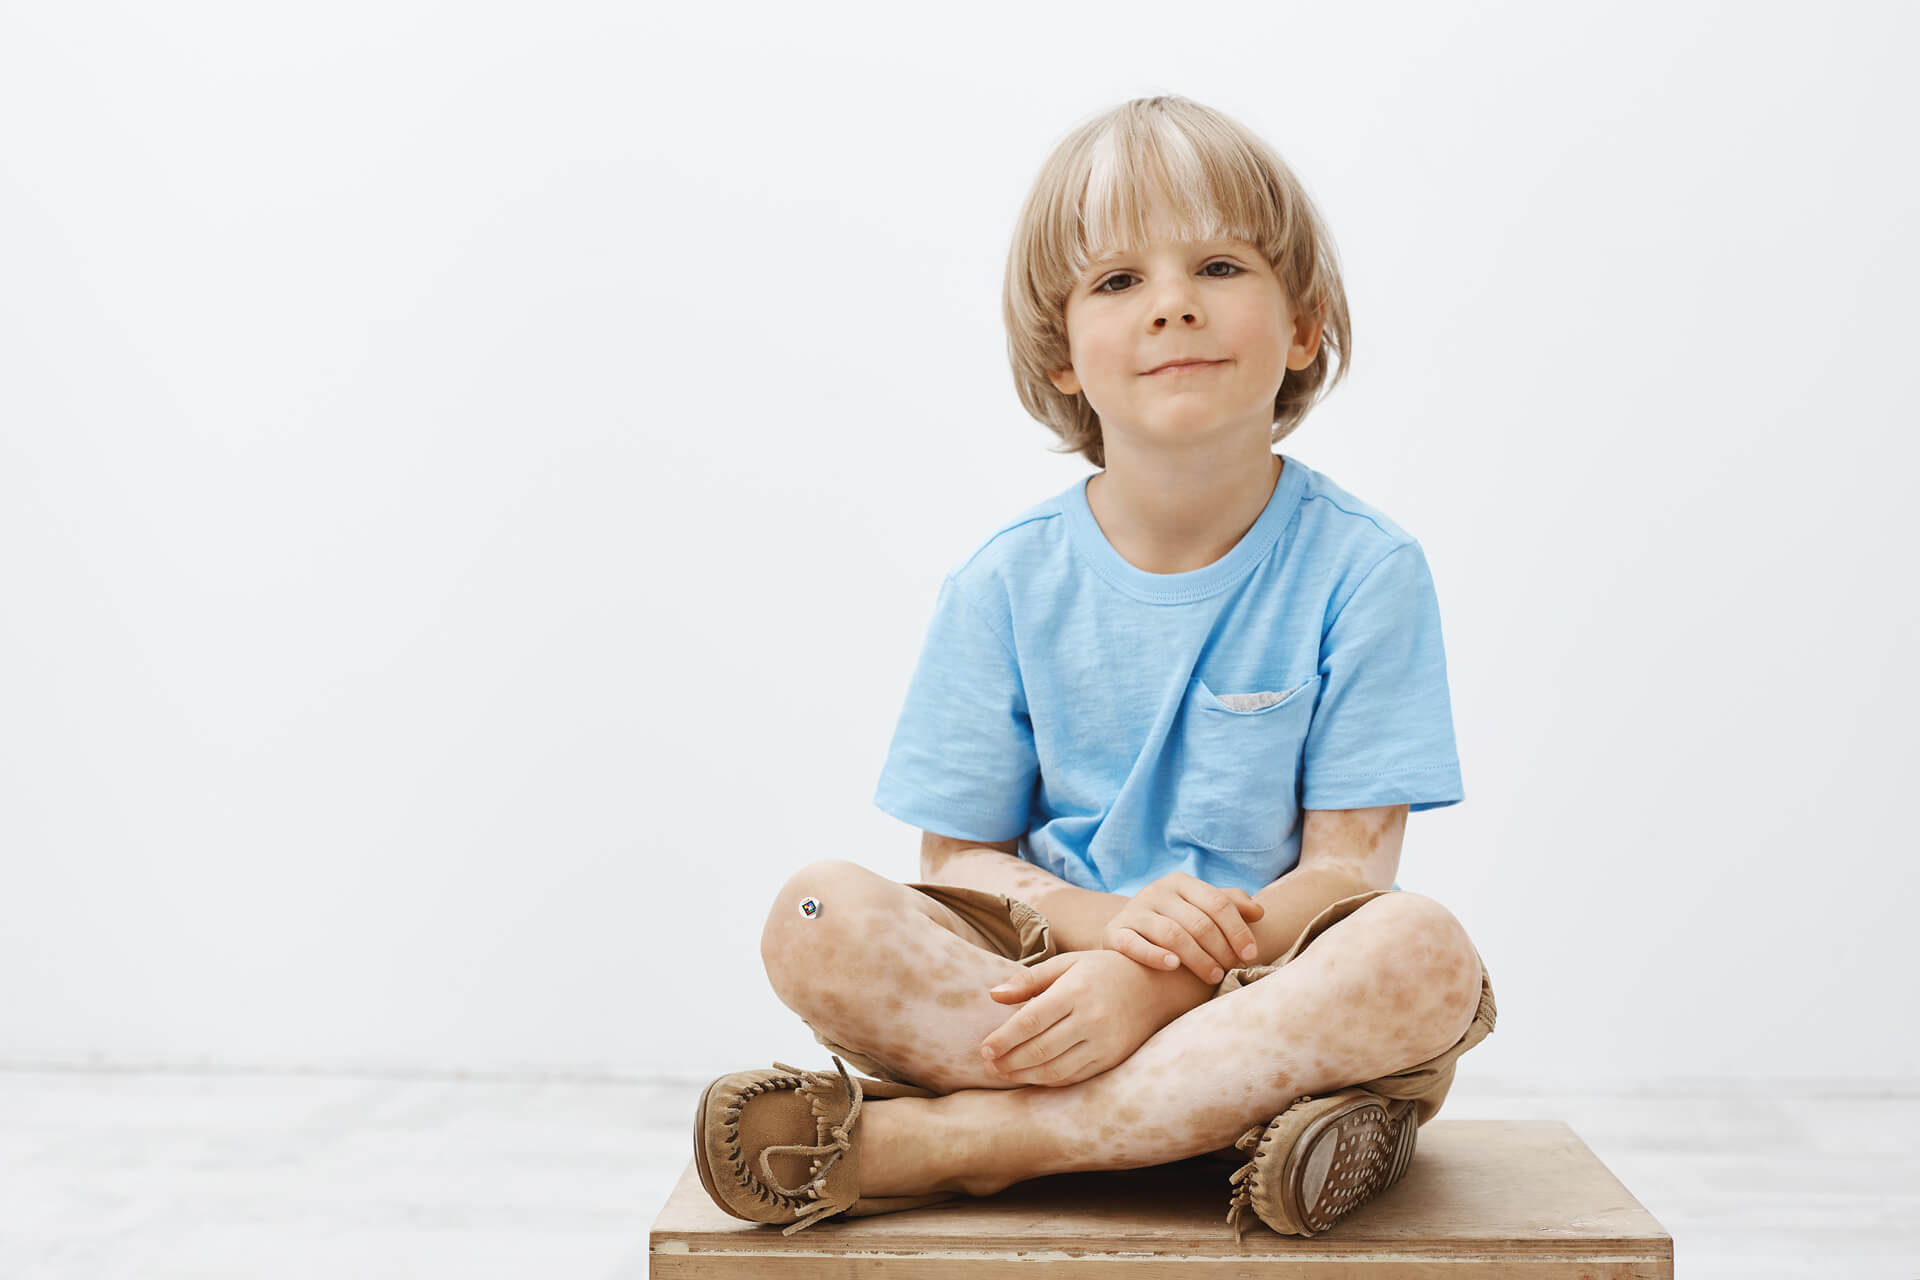 Child with vitiligo with Scarletred skin patch